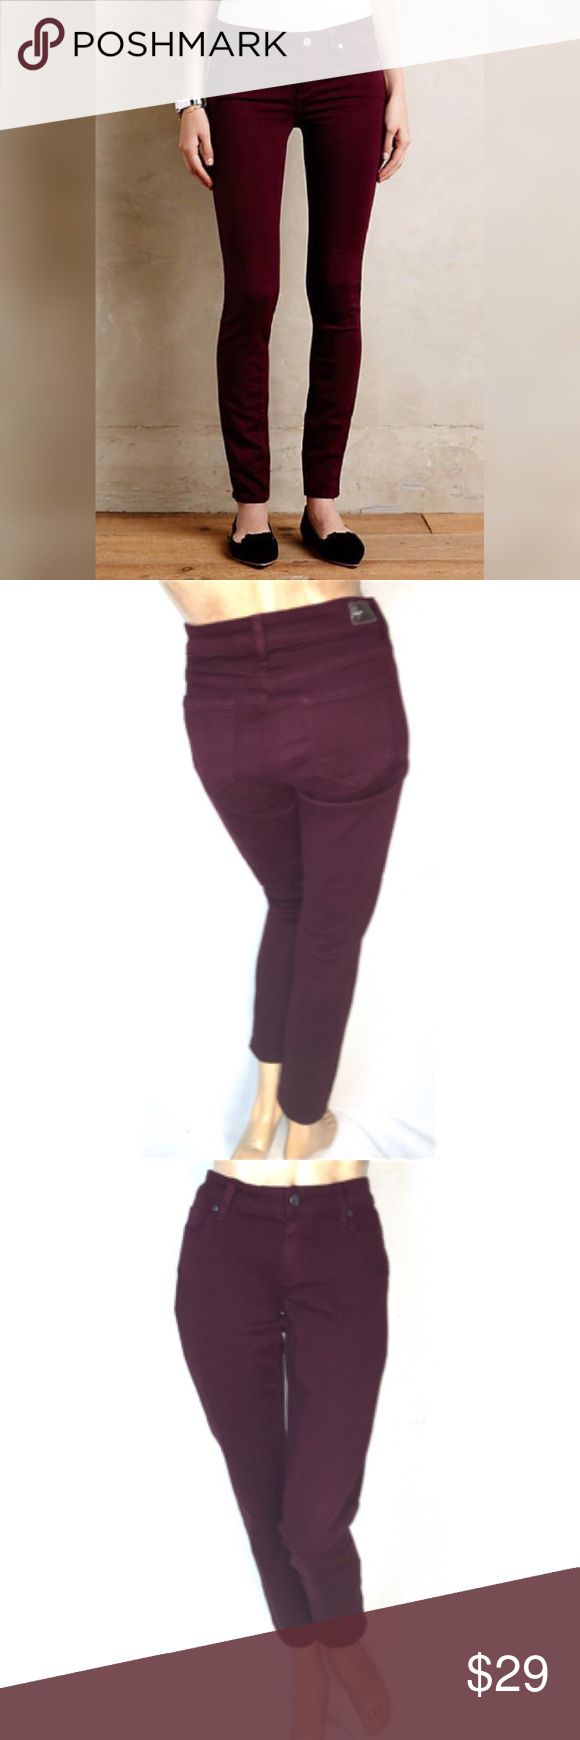 Paige premium denim peg skinny in red wine 27 Paige premium denim peg skinny in red wine 27 Paige Jeans Jeans Straight Leg